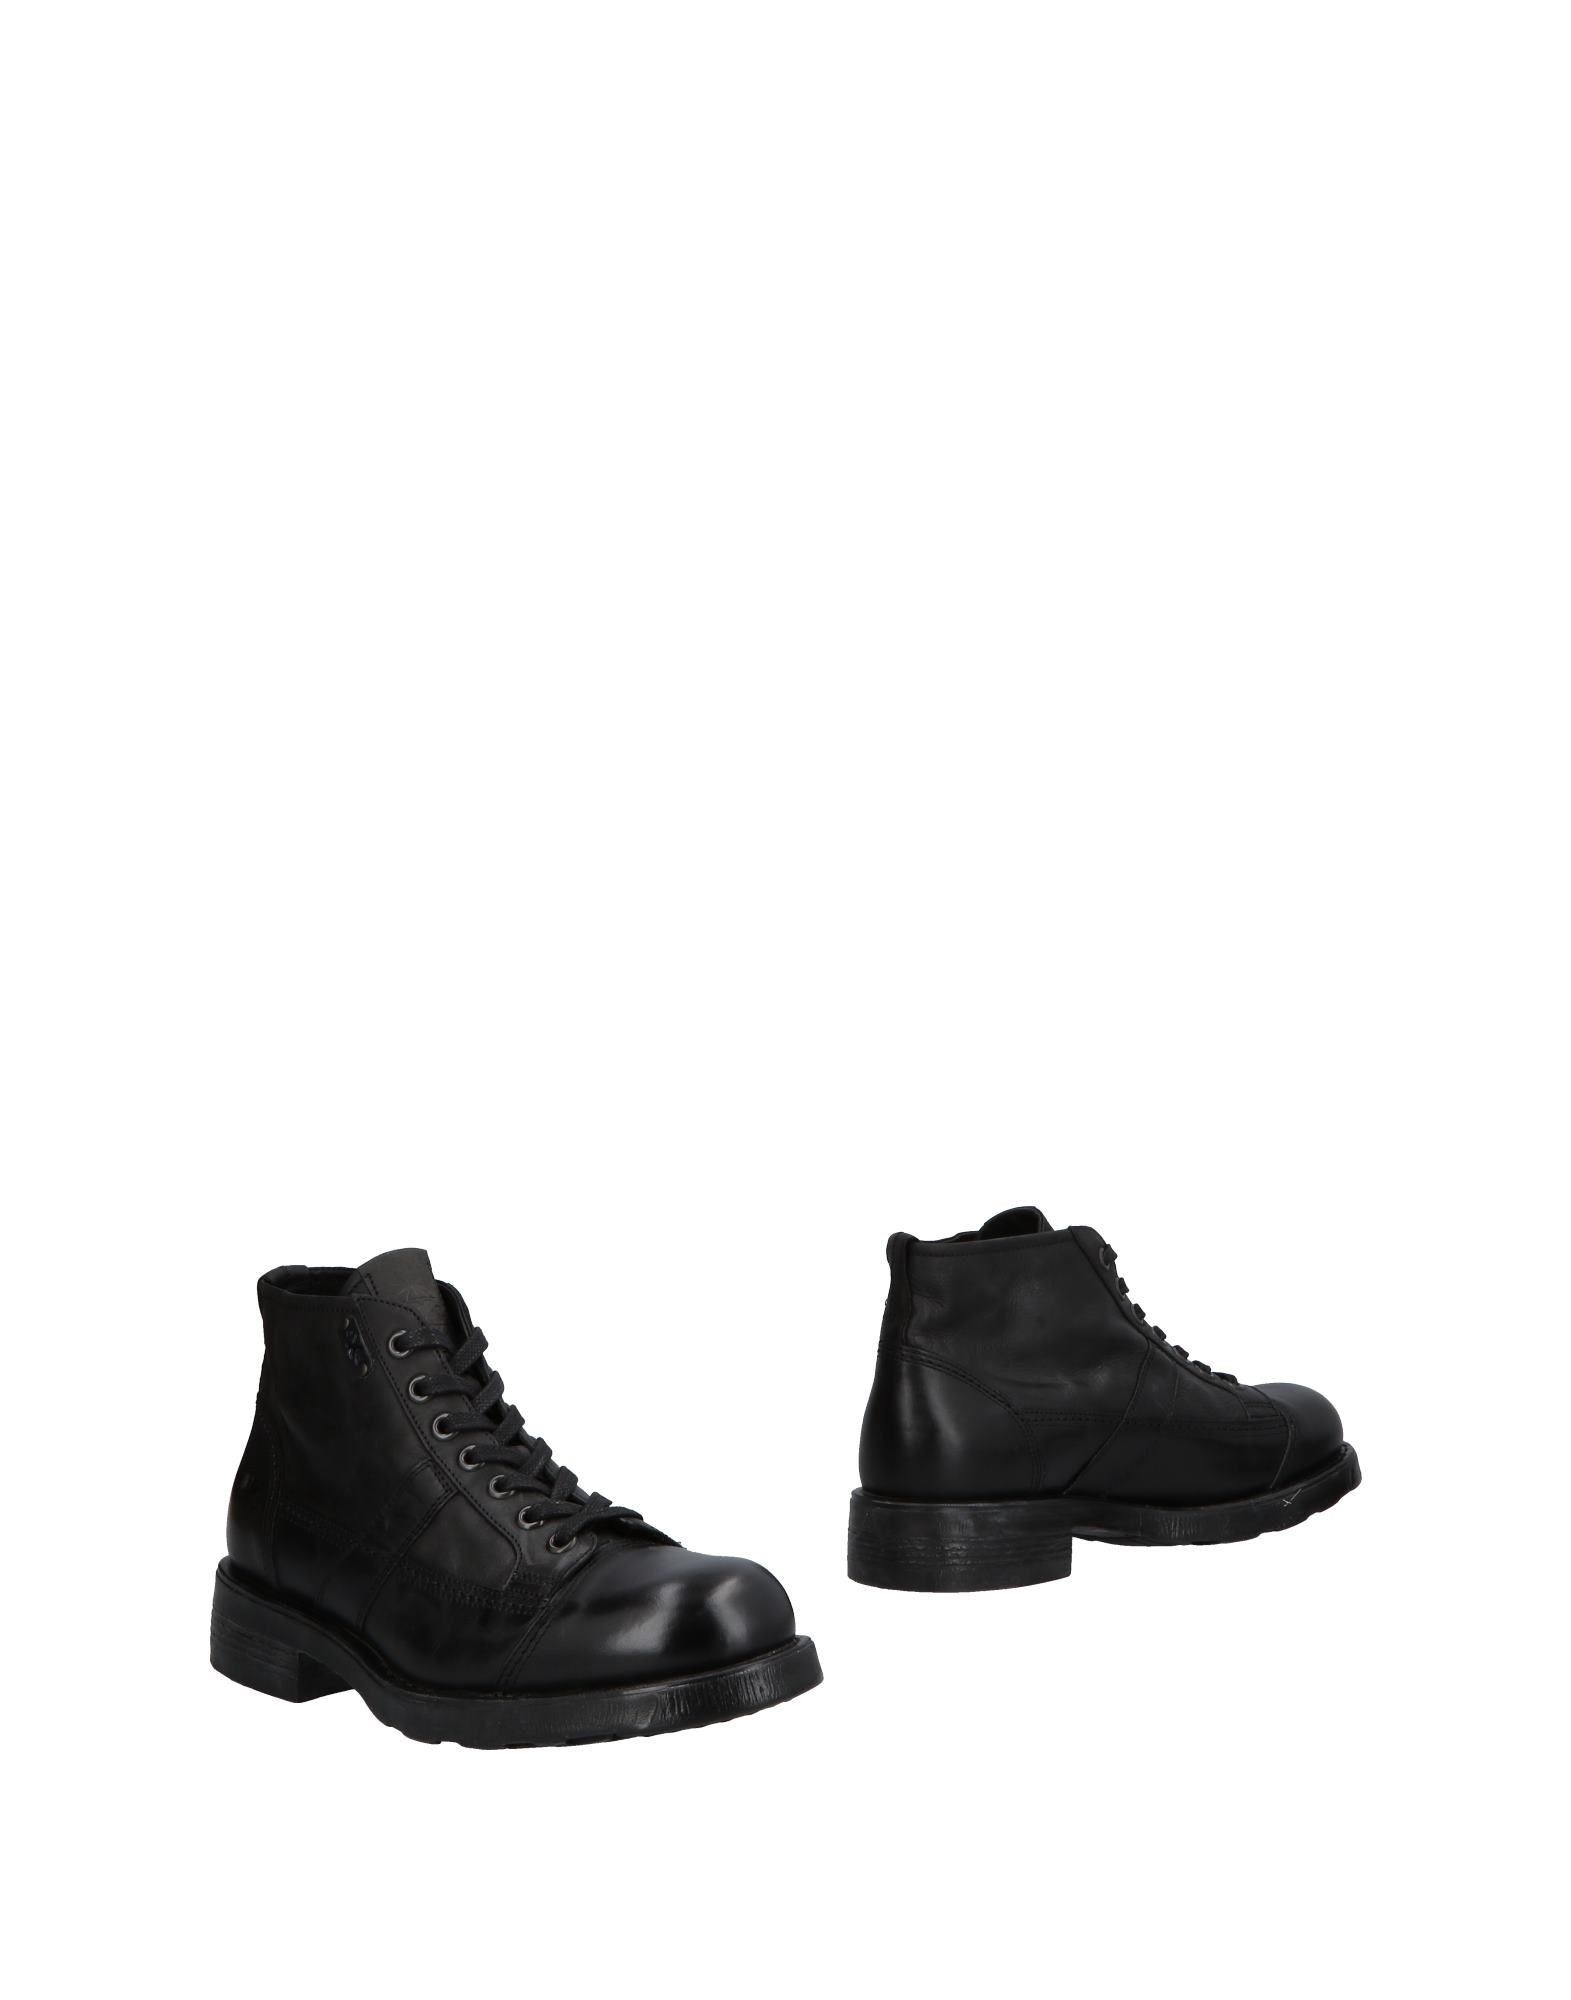 Rabatt echte Schuhe O.X.S. Stiefelette Herren  11497760PD